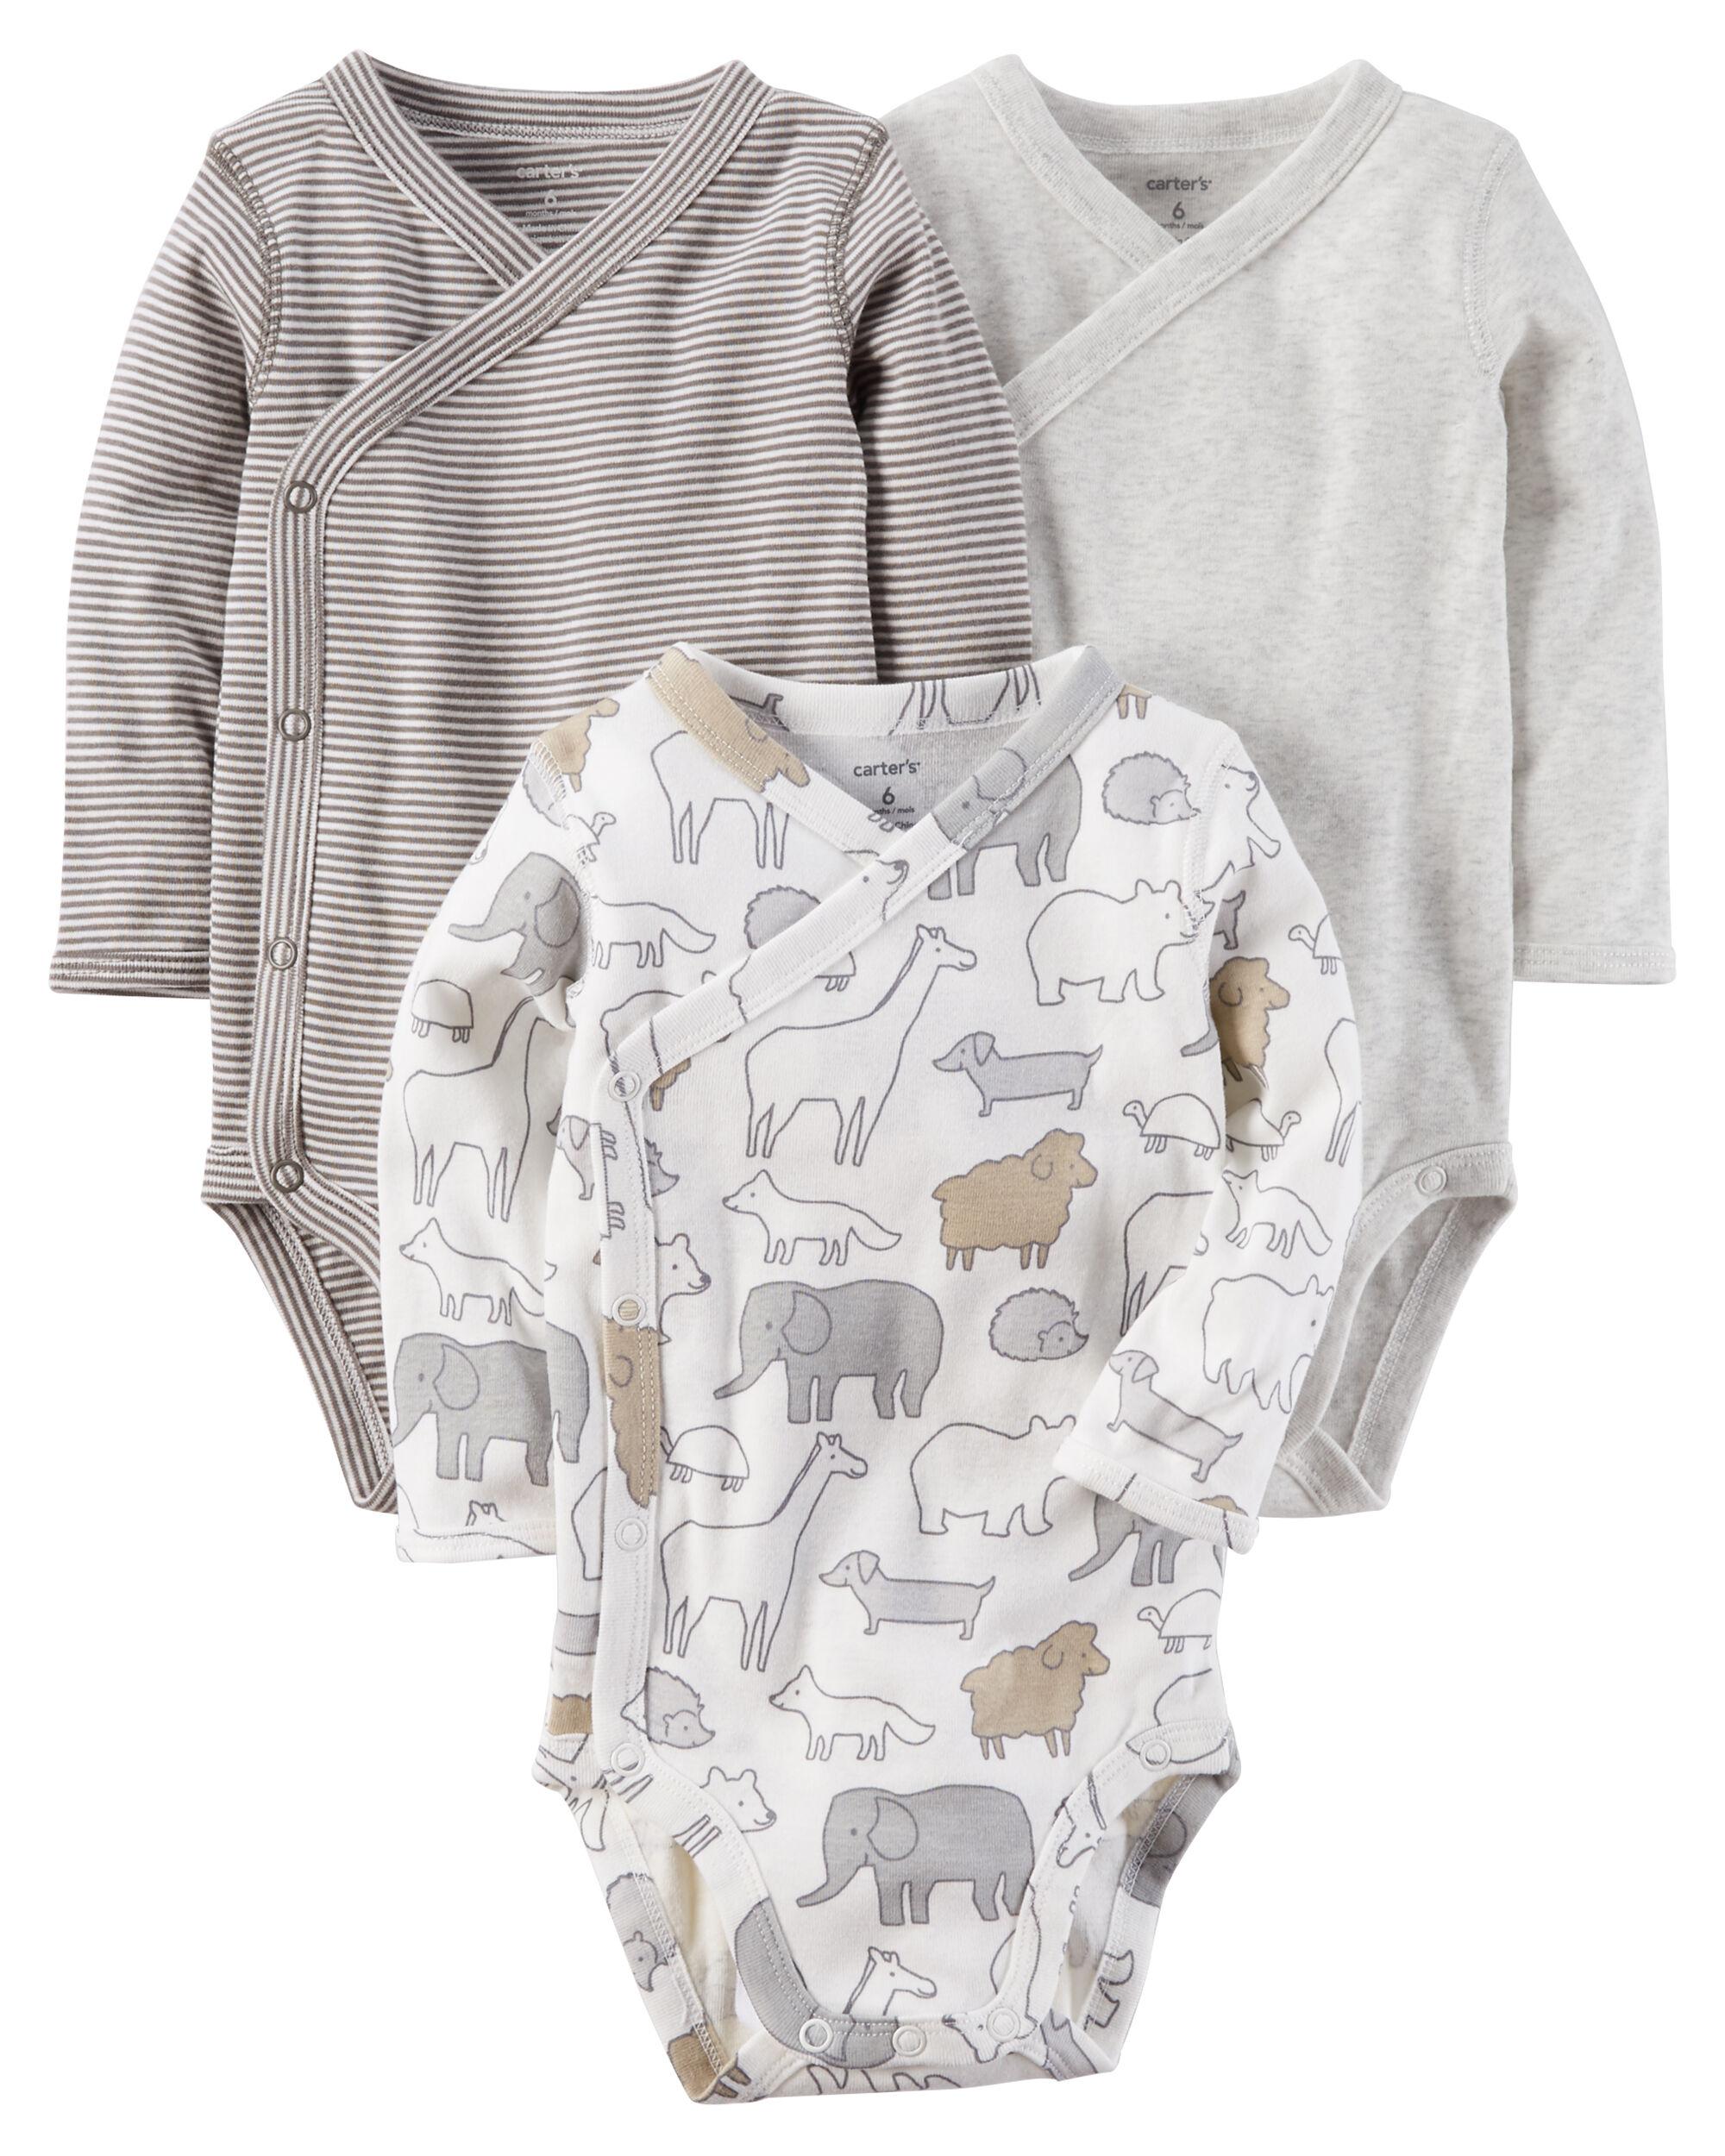 Newborn Baby Boy Clothes Little Baby Basics Carter S